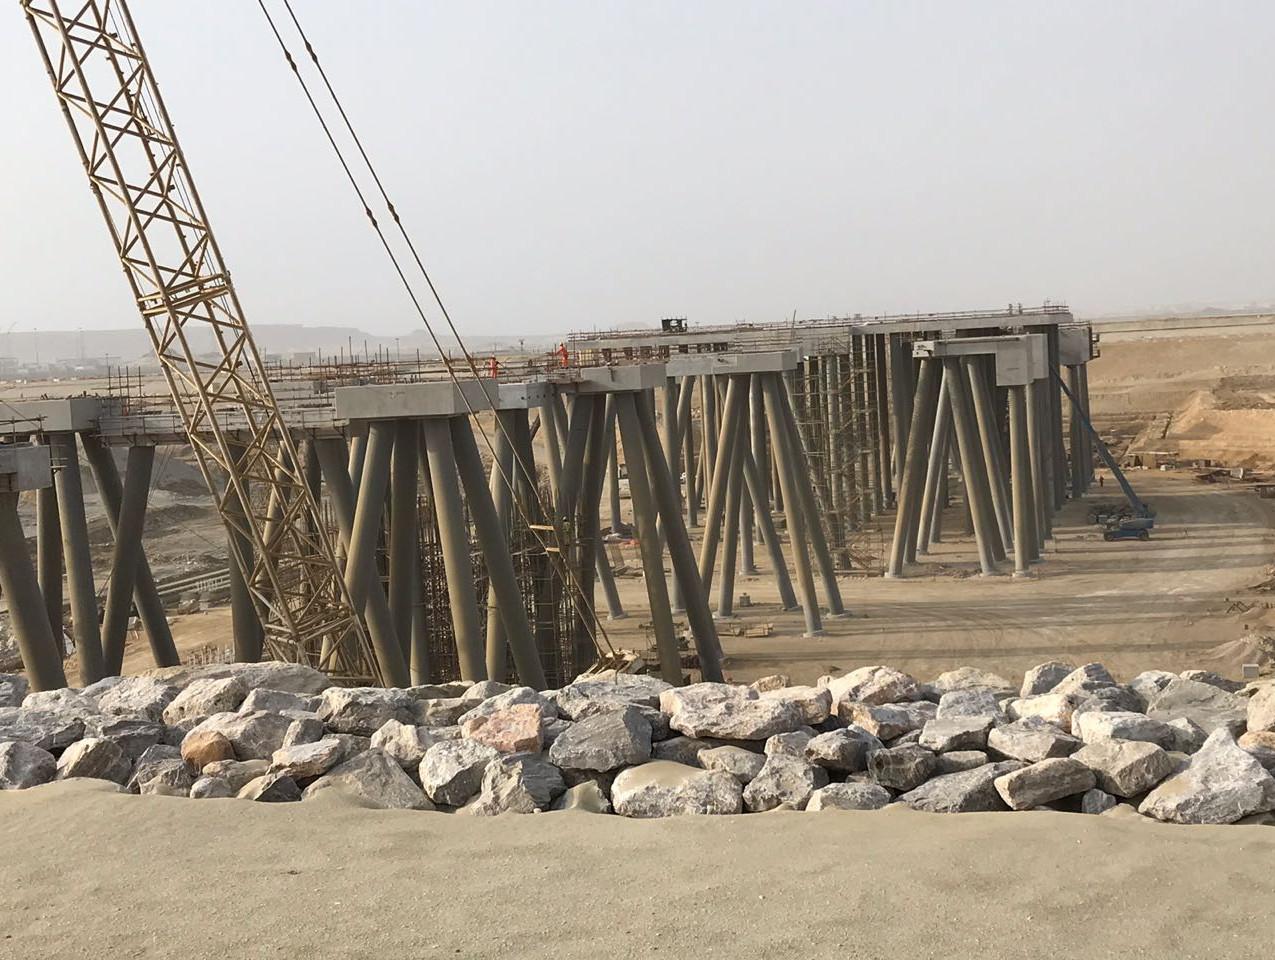 Duqm Oman Installation August 2018 1